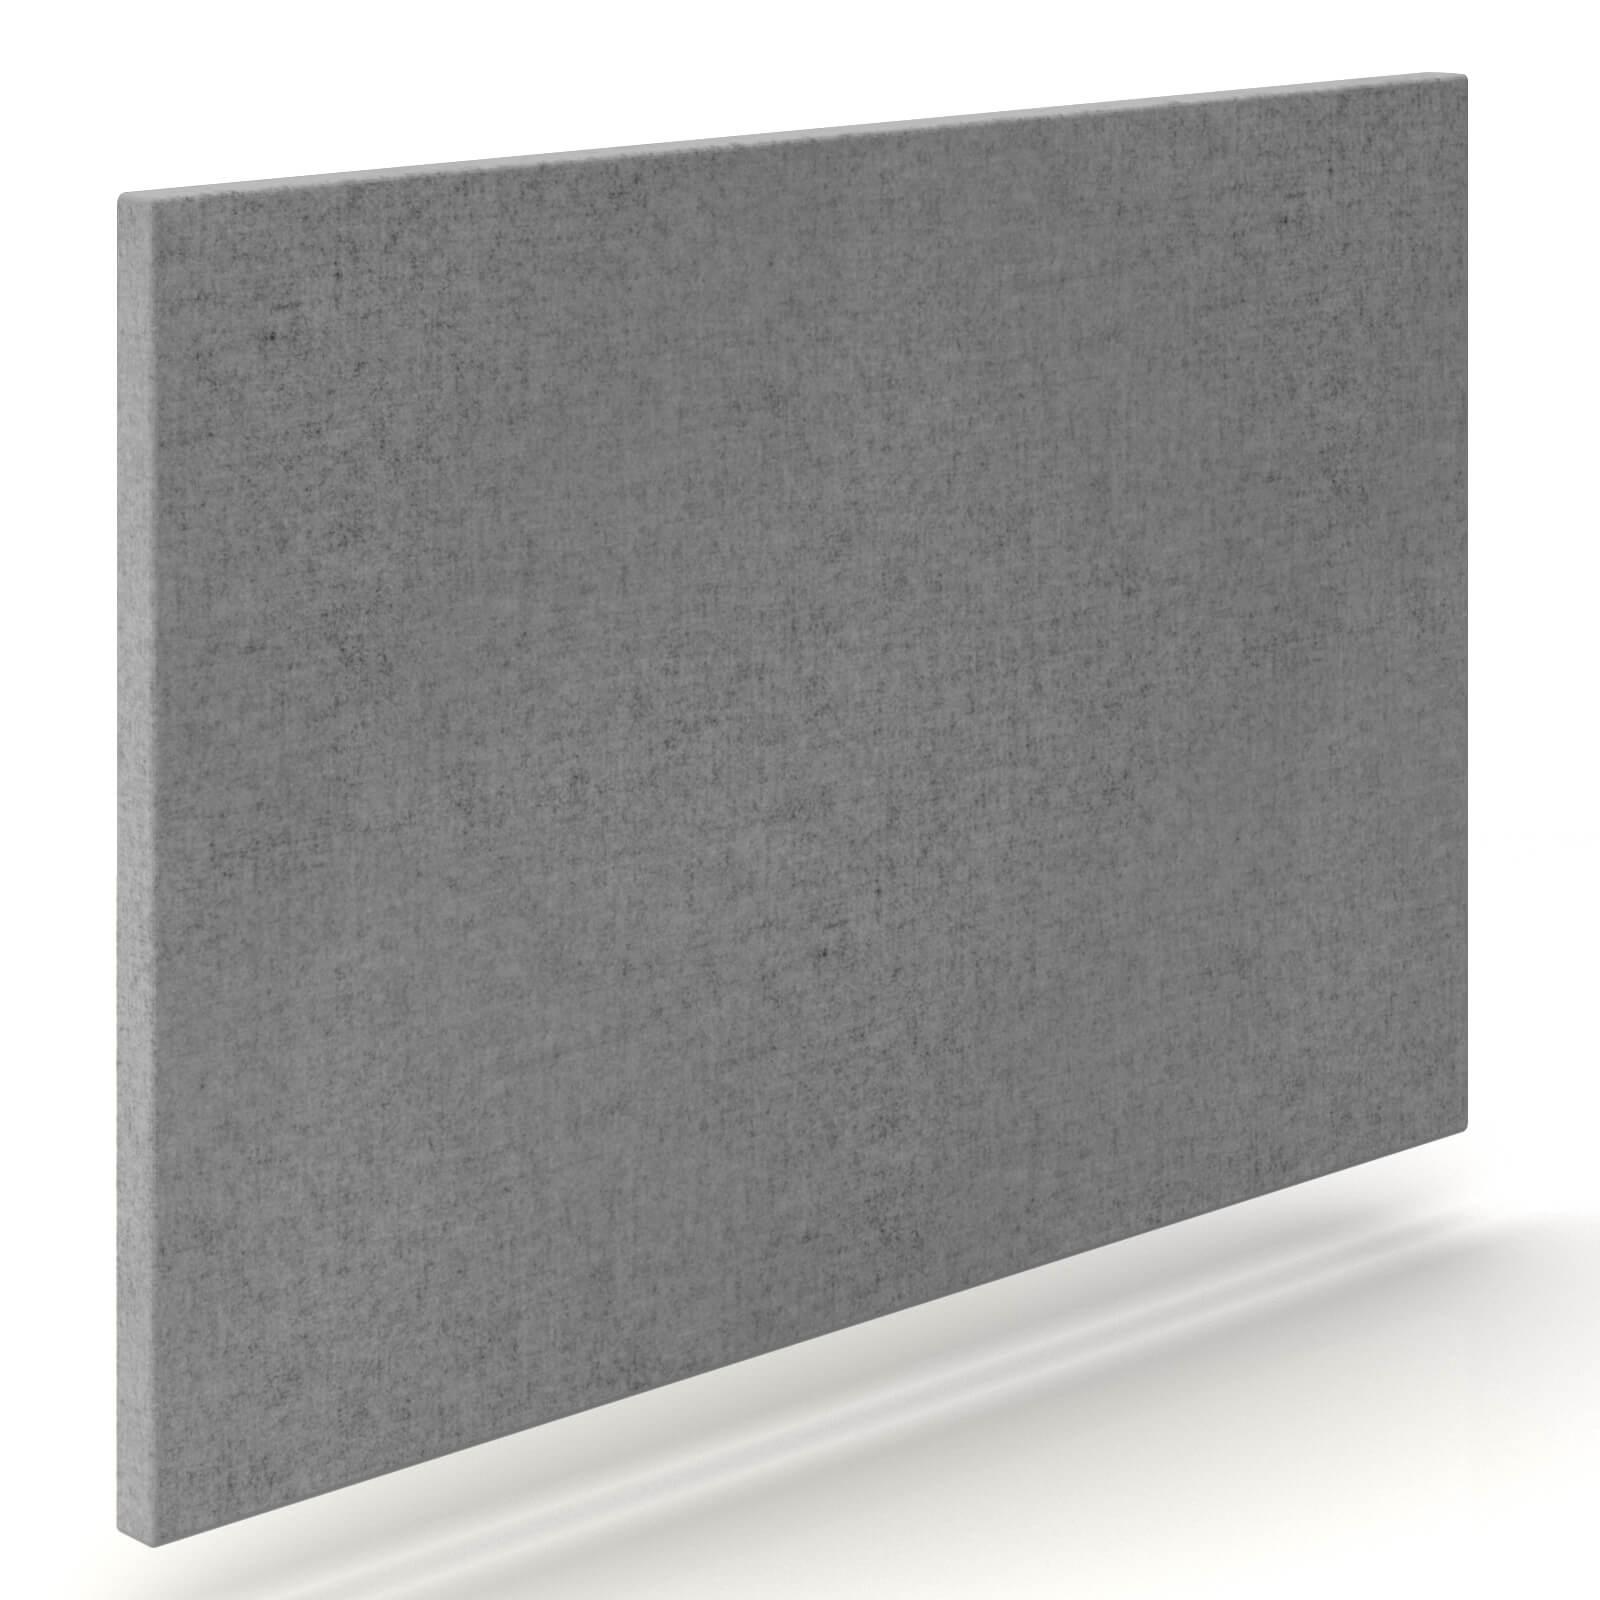 Akustik Wandverkleidung MODUS 1.200 x 800 mm Akustikplatten Wandpaneele Filz